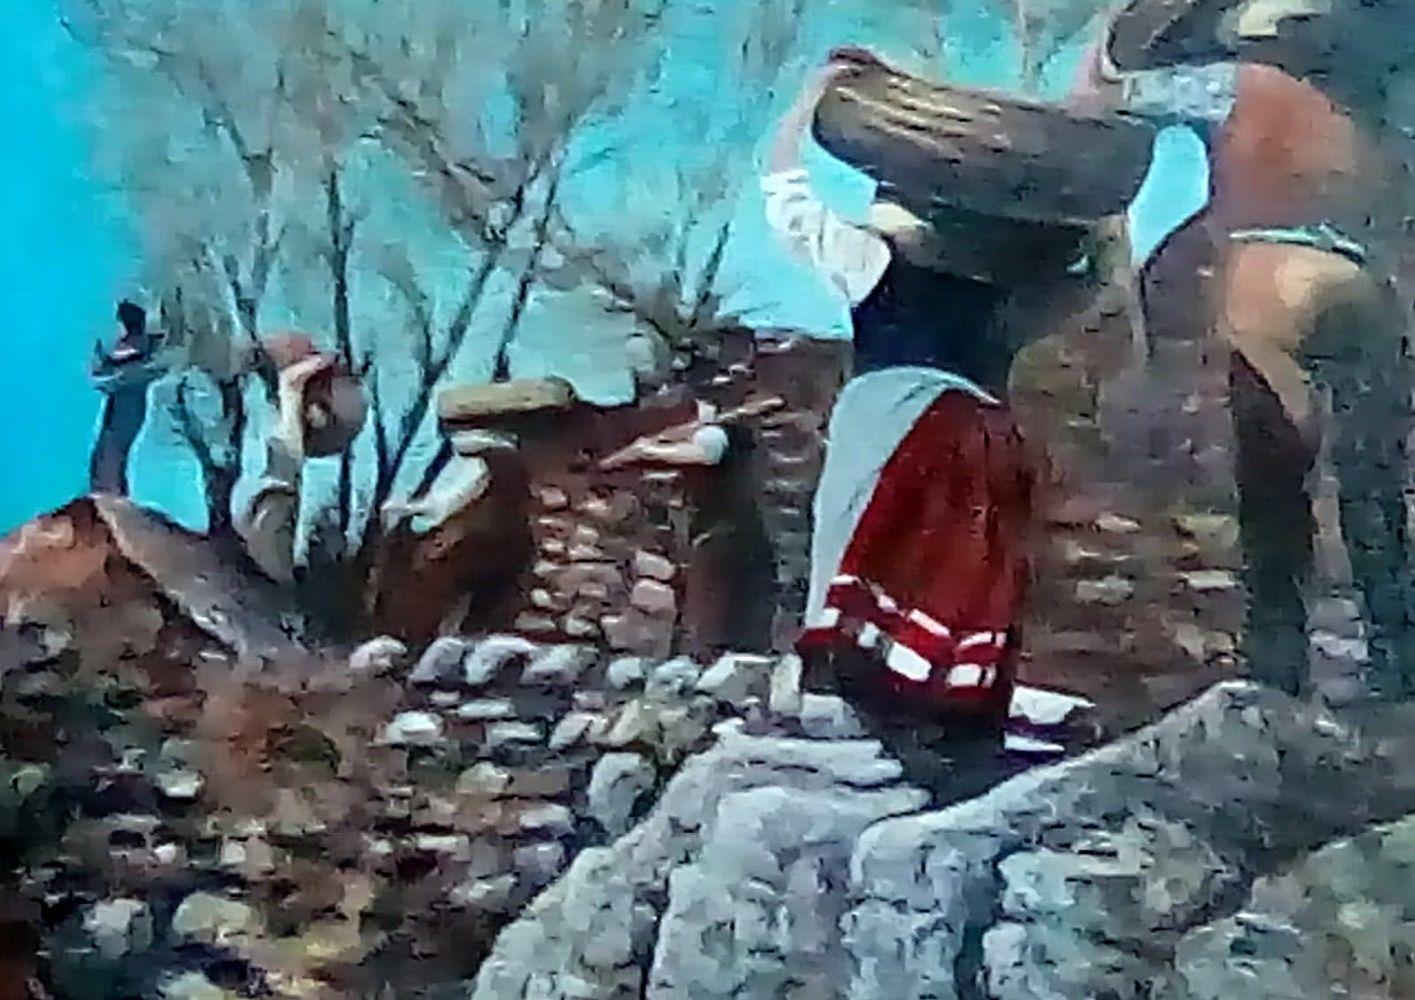 Valtorta Gianfranco - 01